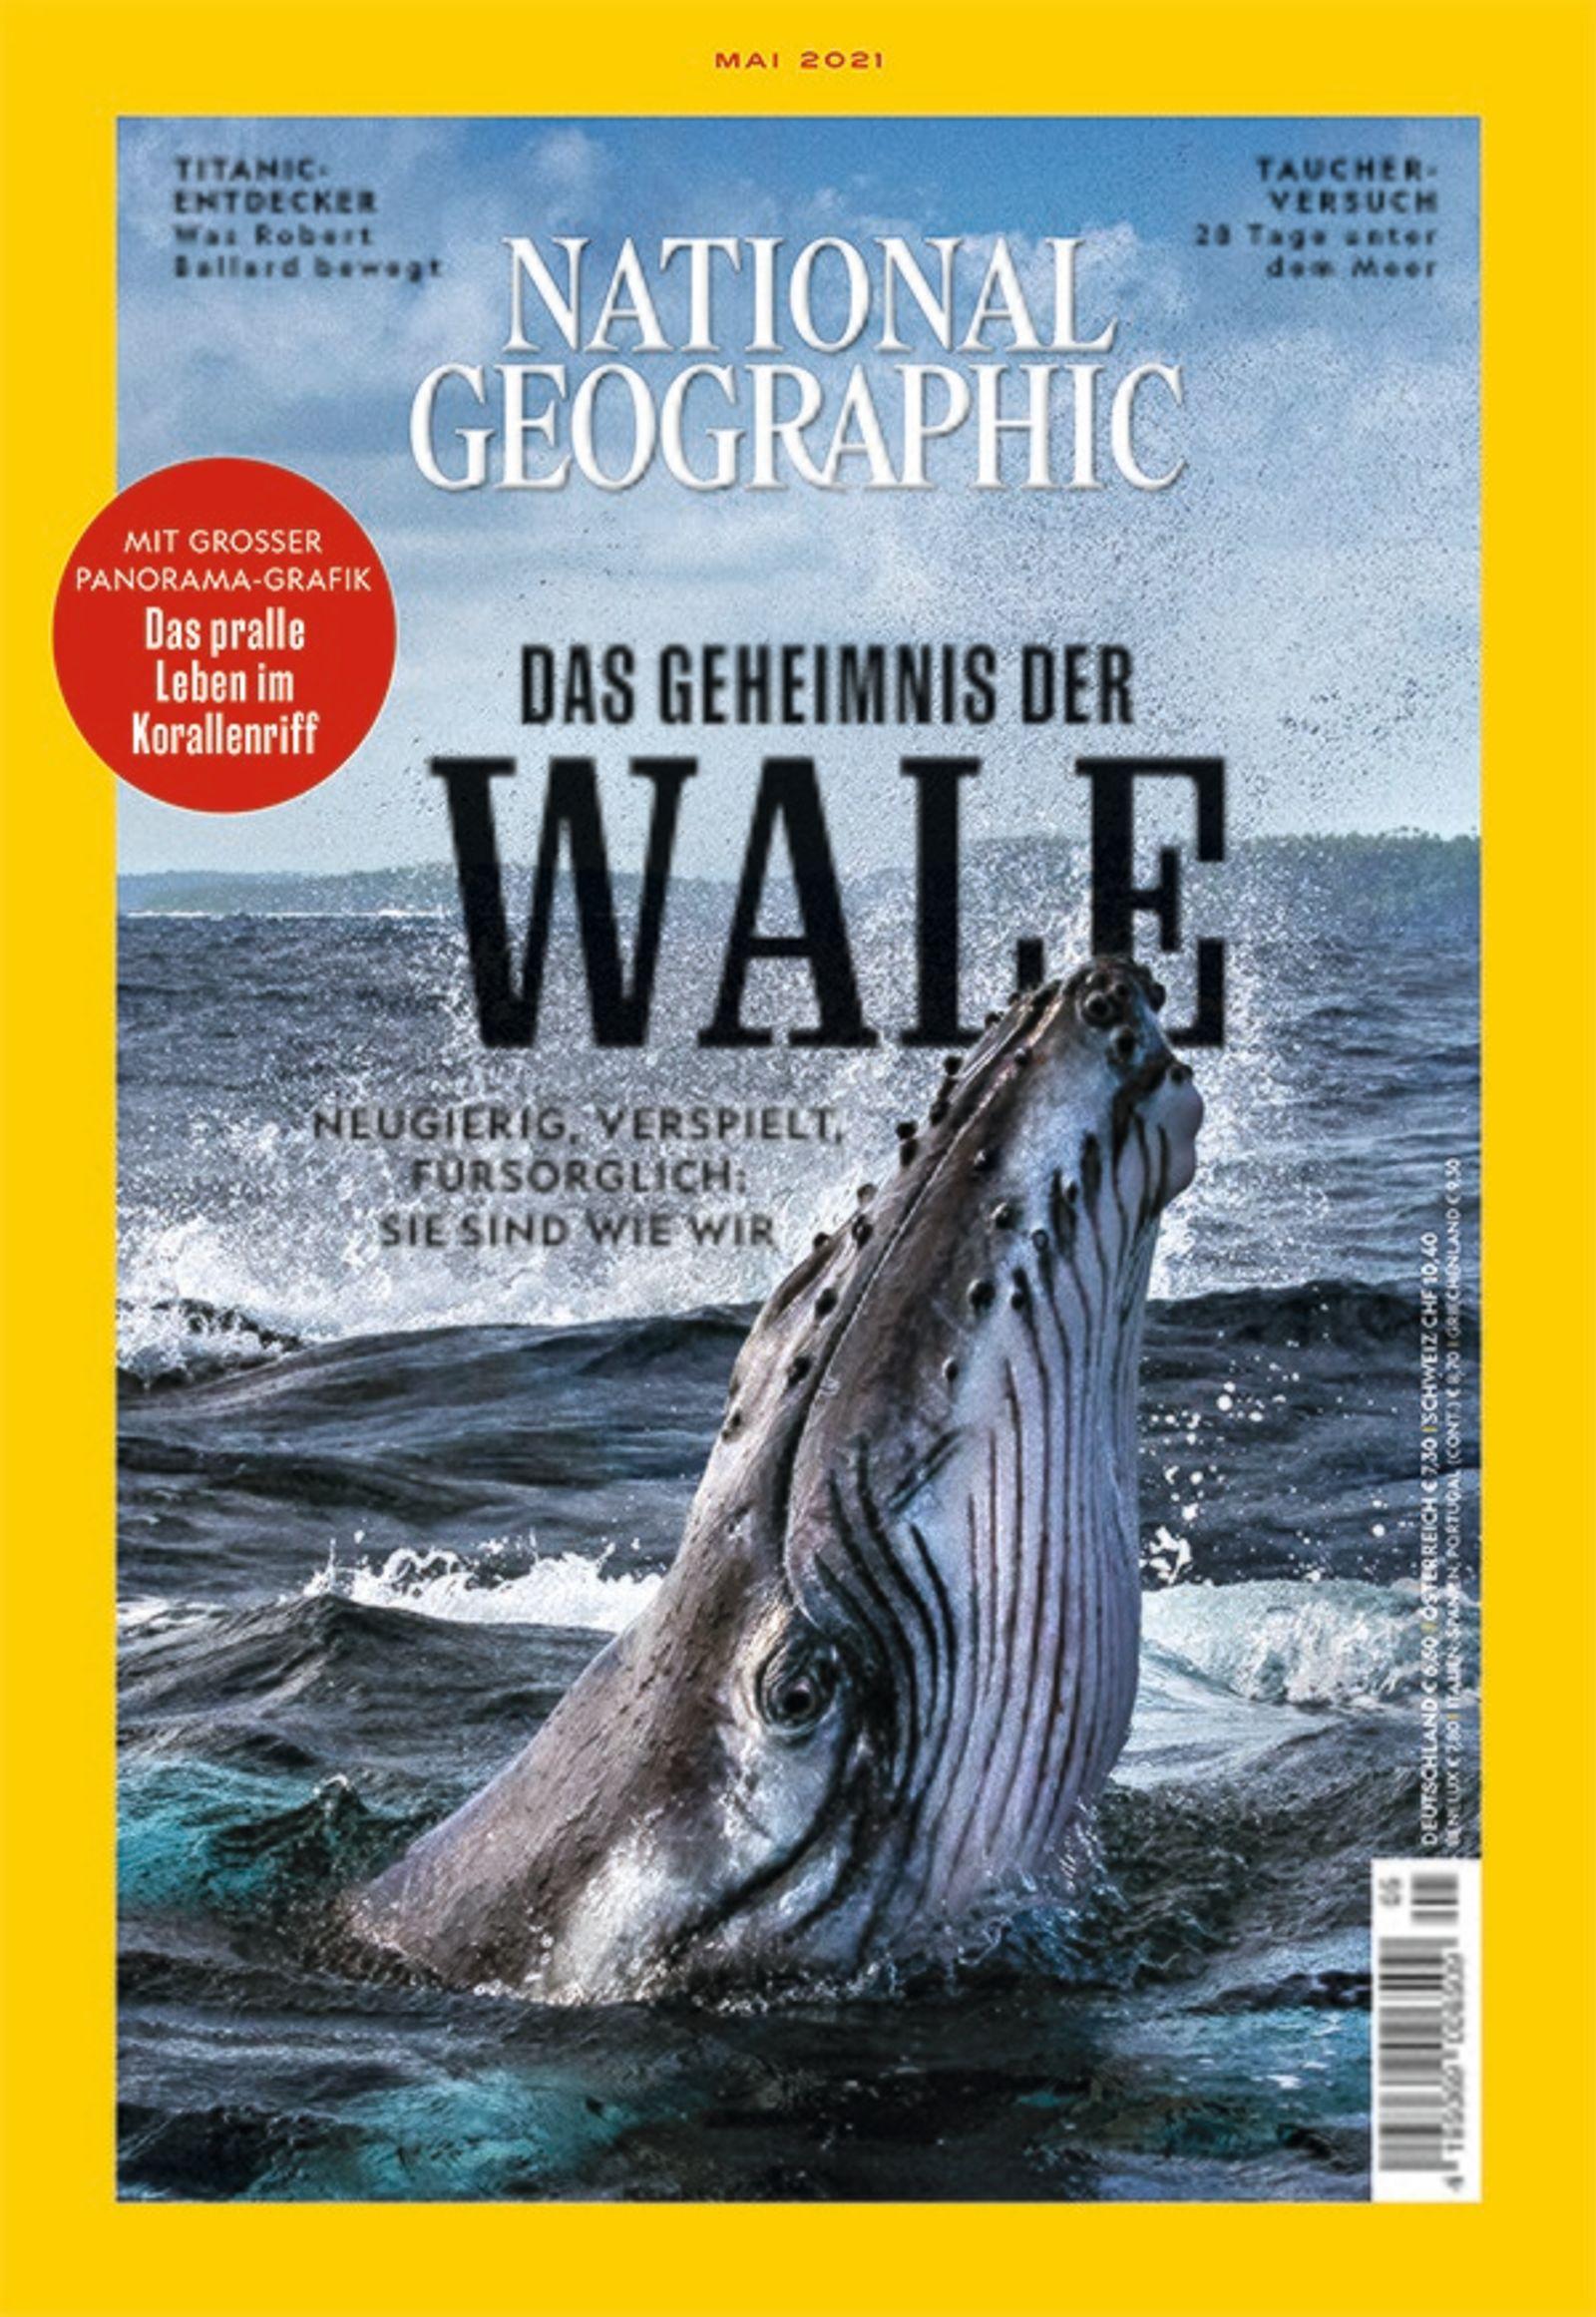 National Geographic Magazin 05/2021